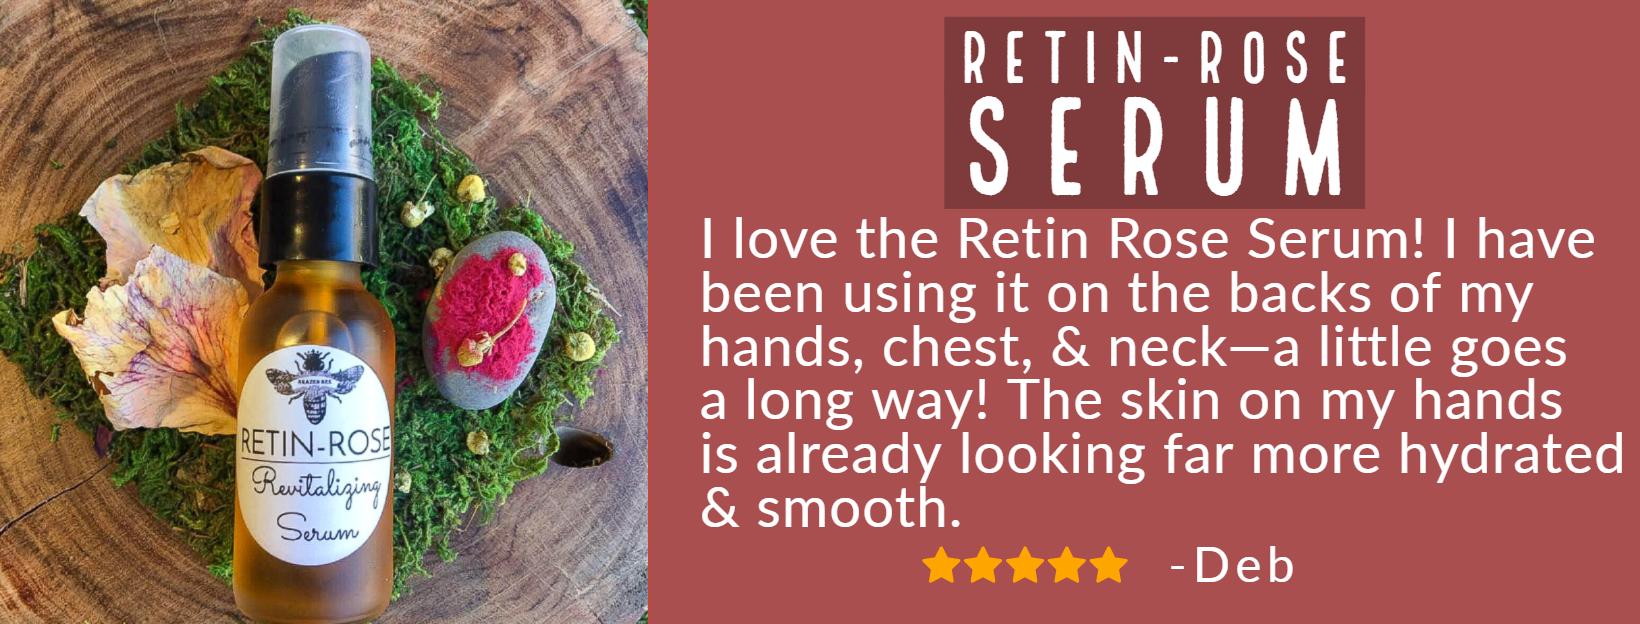 Retin-Rose